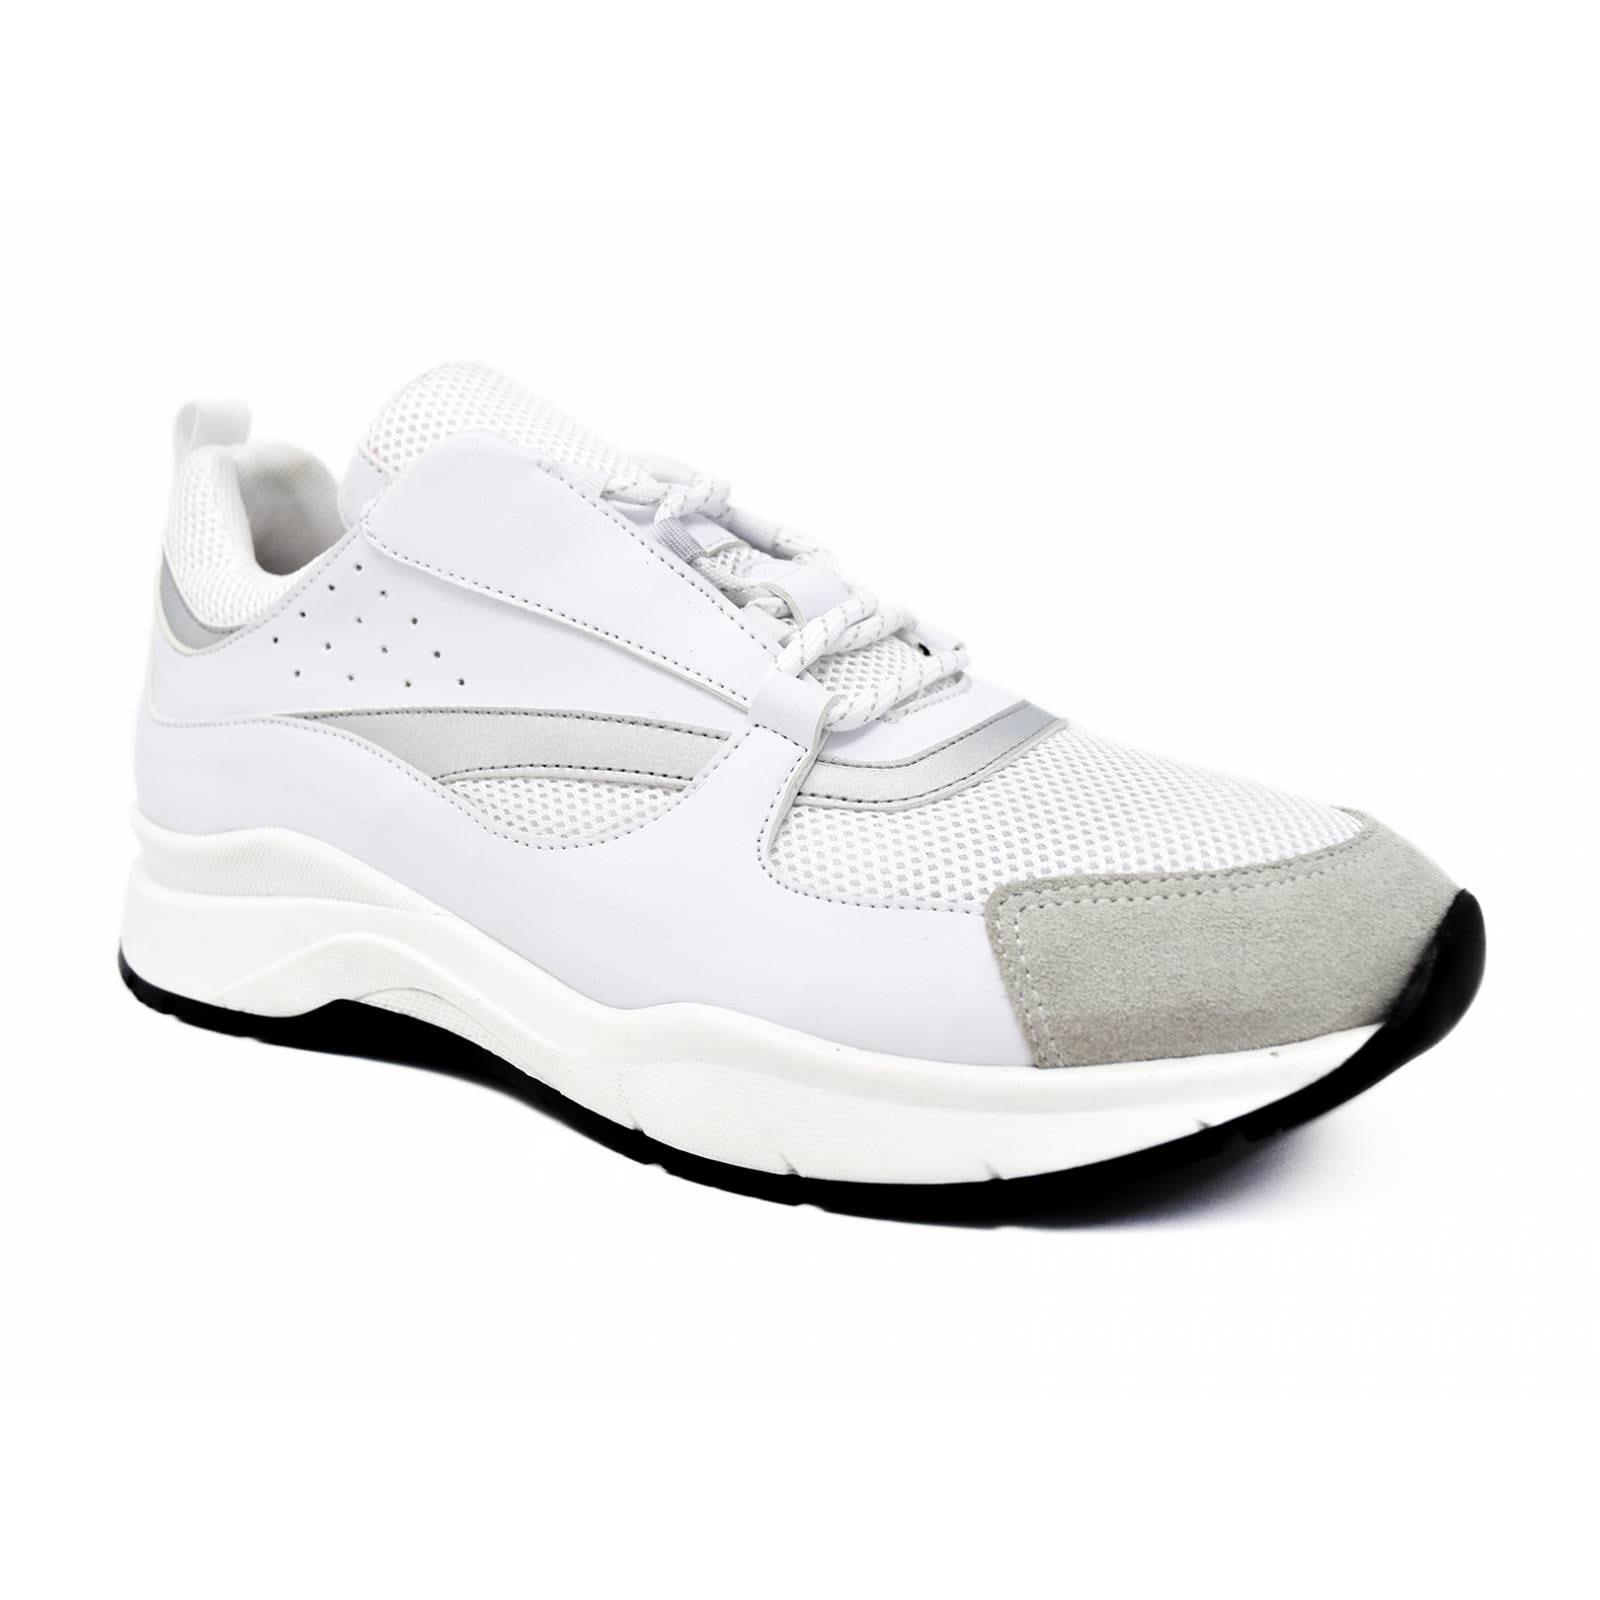 Tenis Cream Soda para hombre sport - moh 300 a  blanco silver